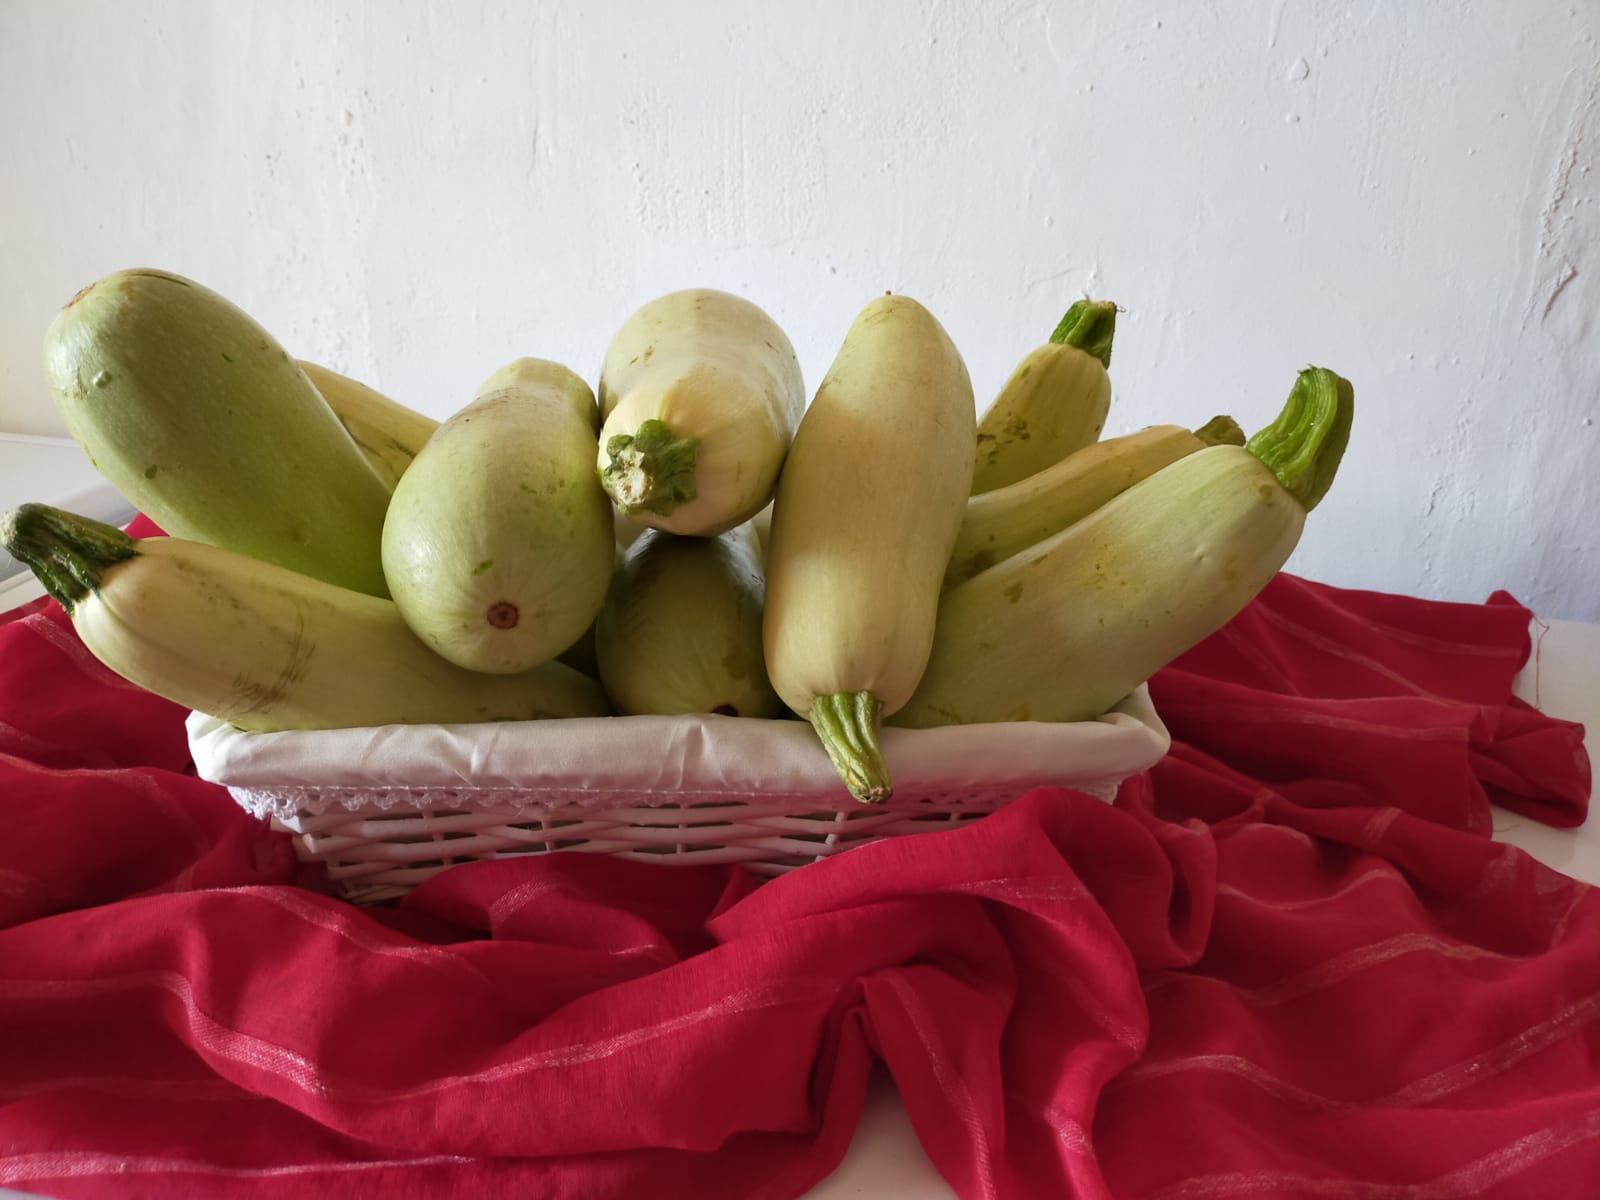 Calabacines blanco